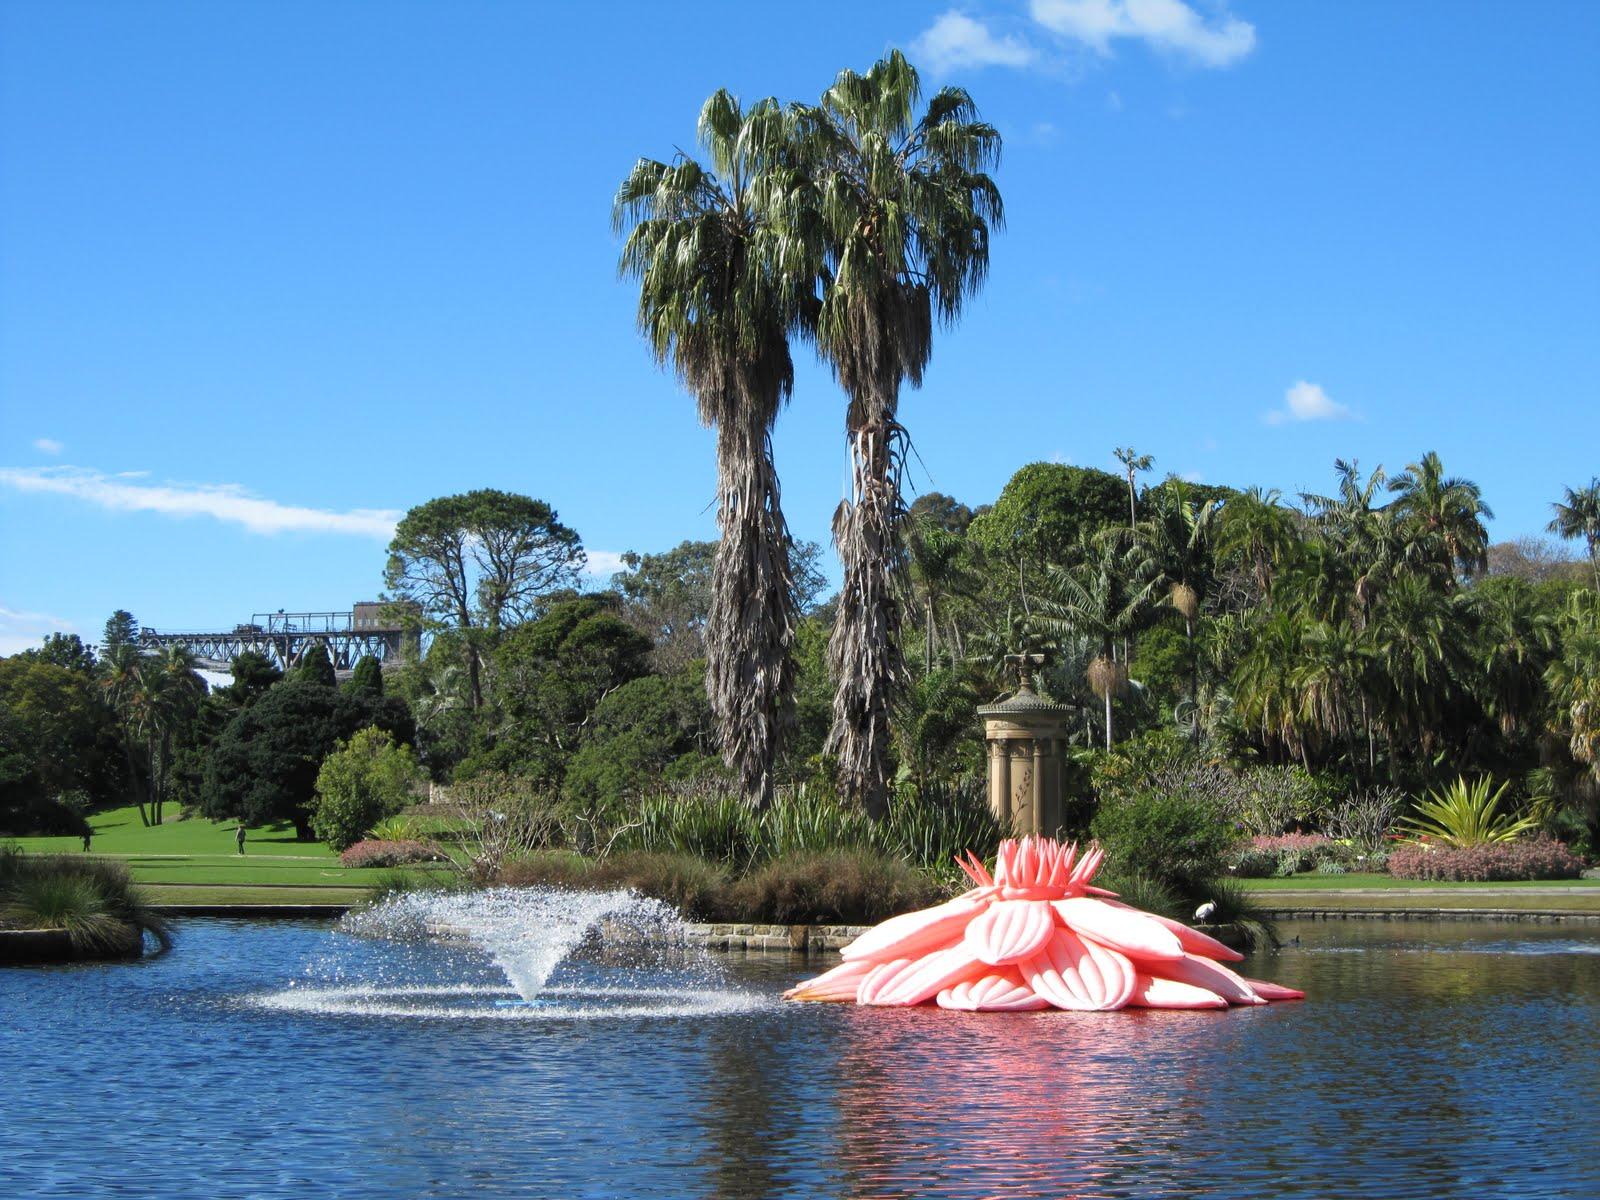 Sydney City And Suburbs Botanic Gardens Biennale The Unbearable Lightness Of Being